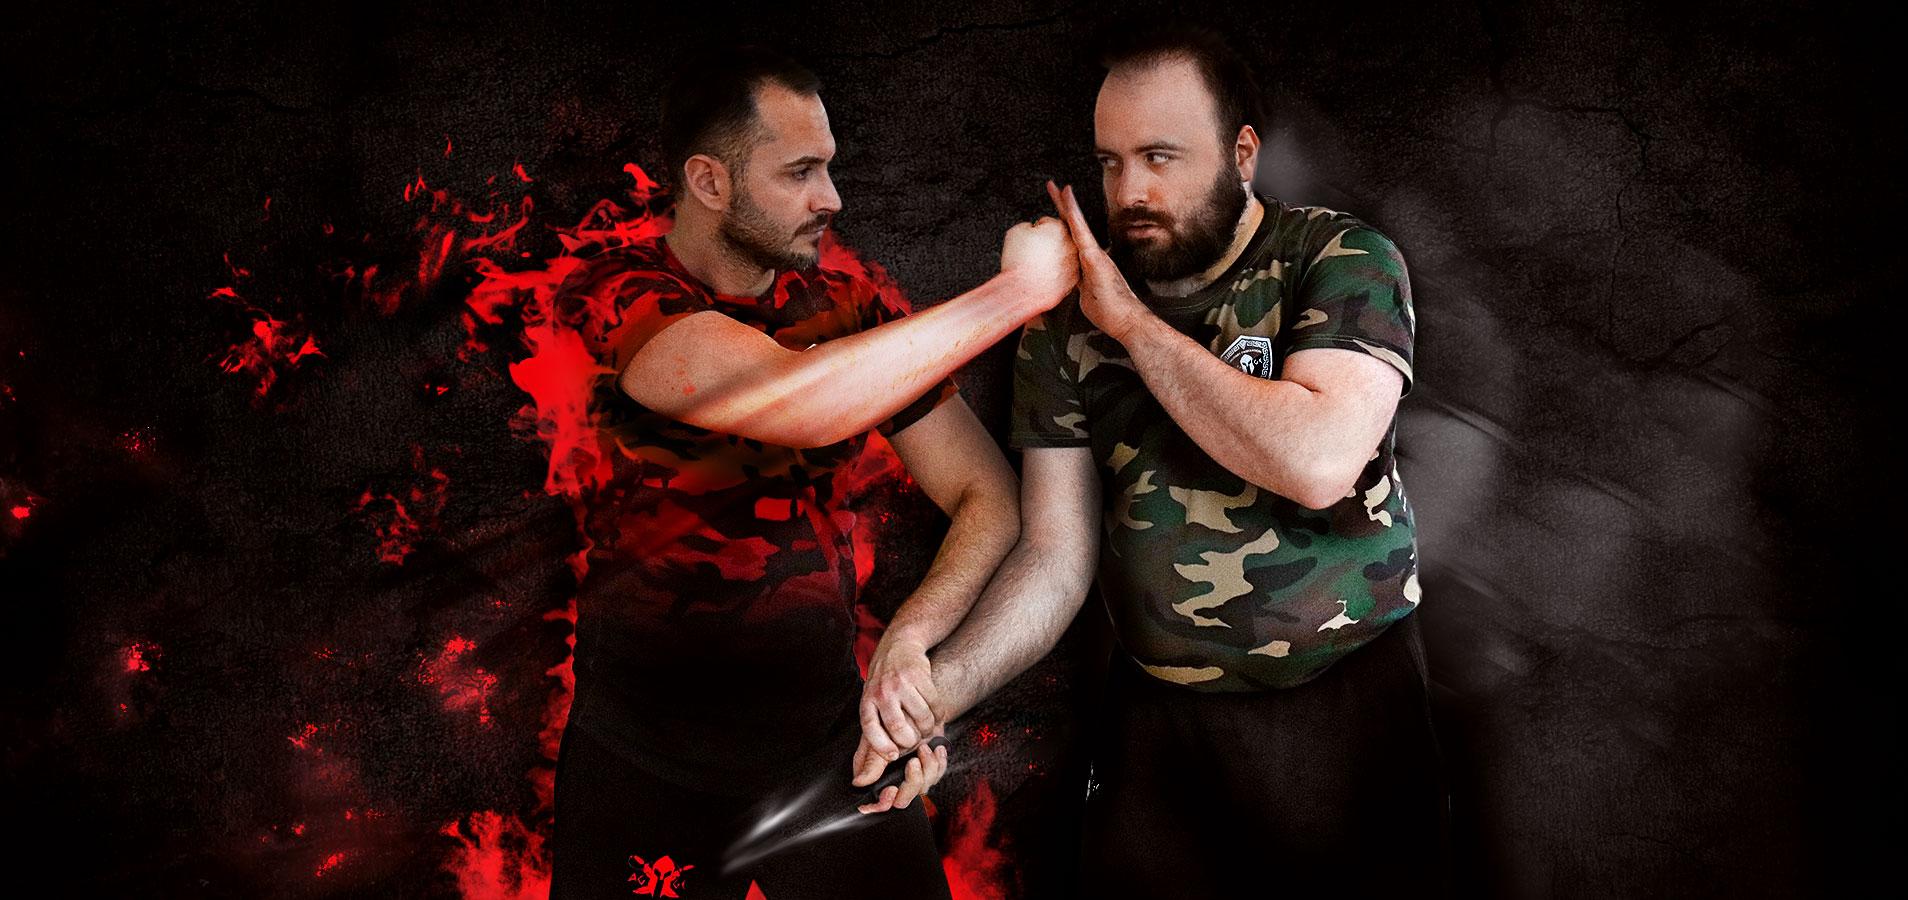 martial arts pankration stuttgart west bad cannstatt ludwigsburg waiblingen esslingen stuttgart vaihingen